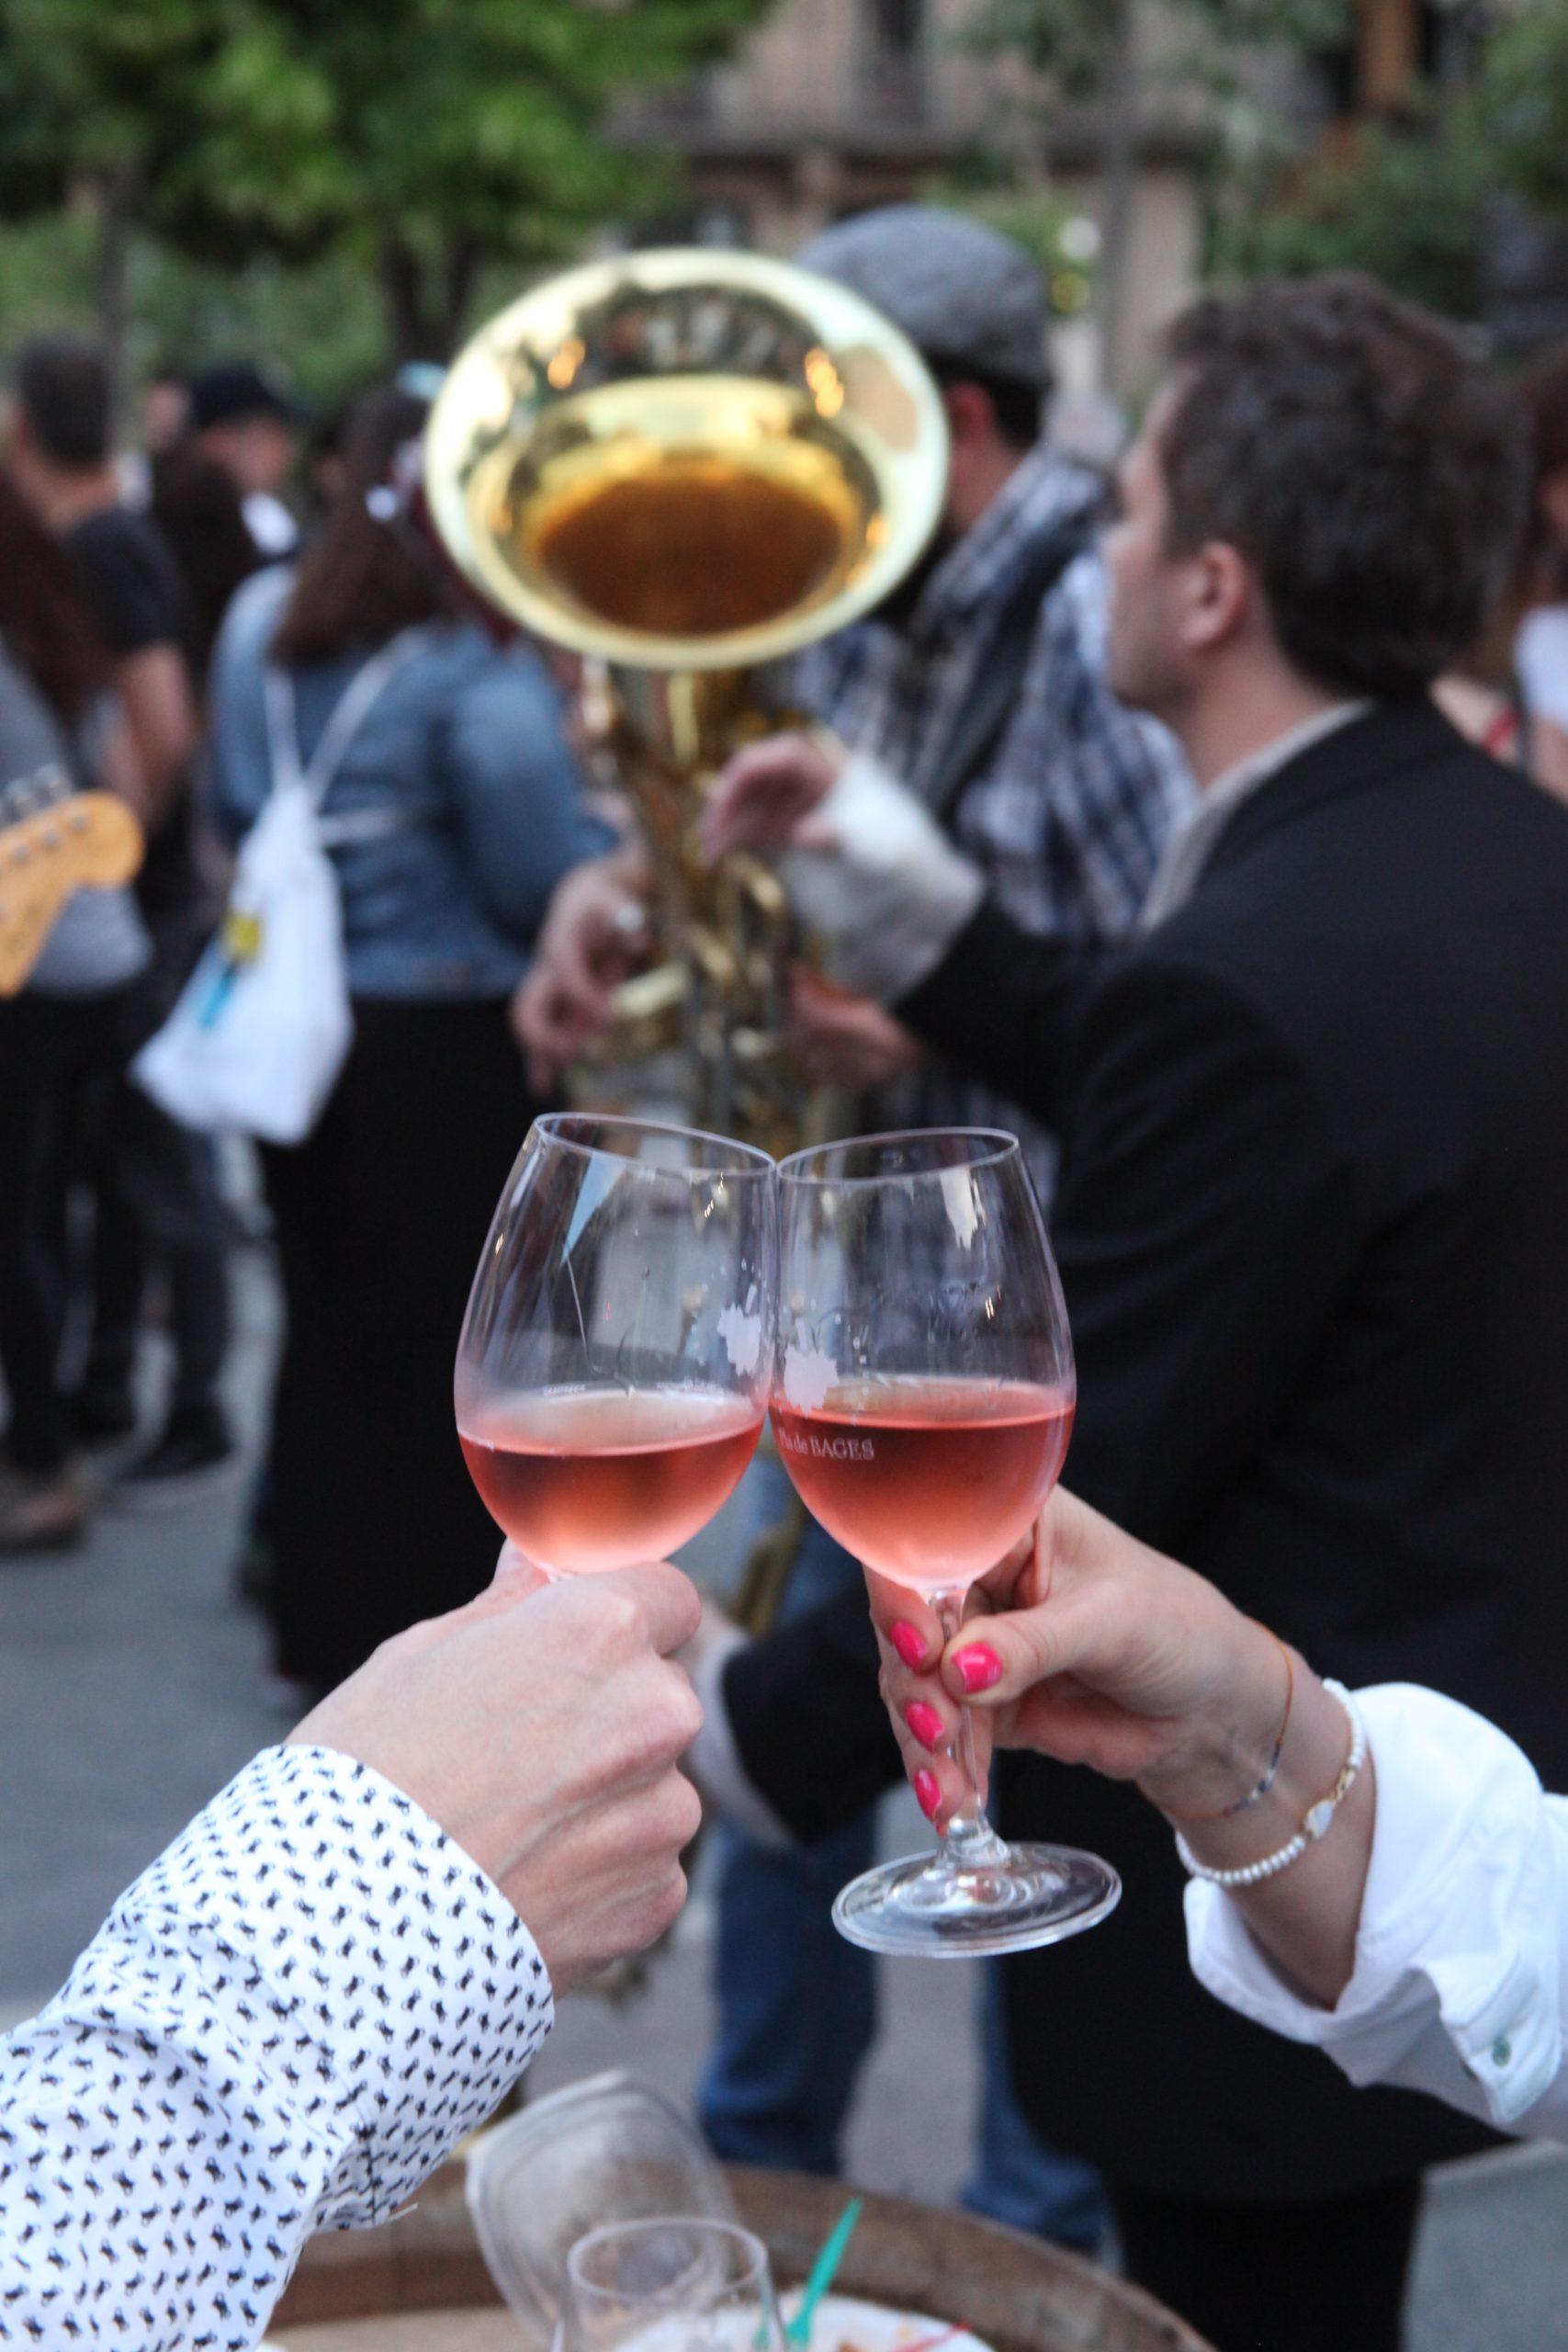 La Fira del Vi del Bages | Fira del Vi del Bages